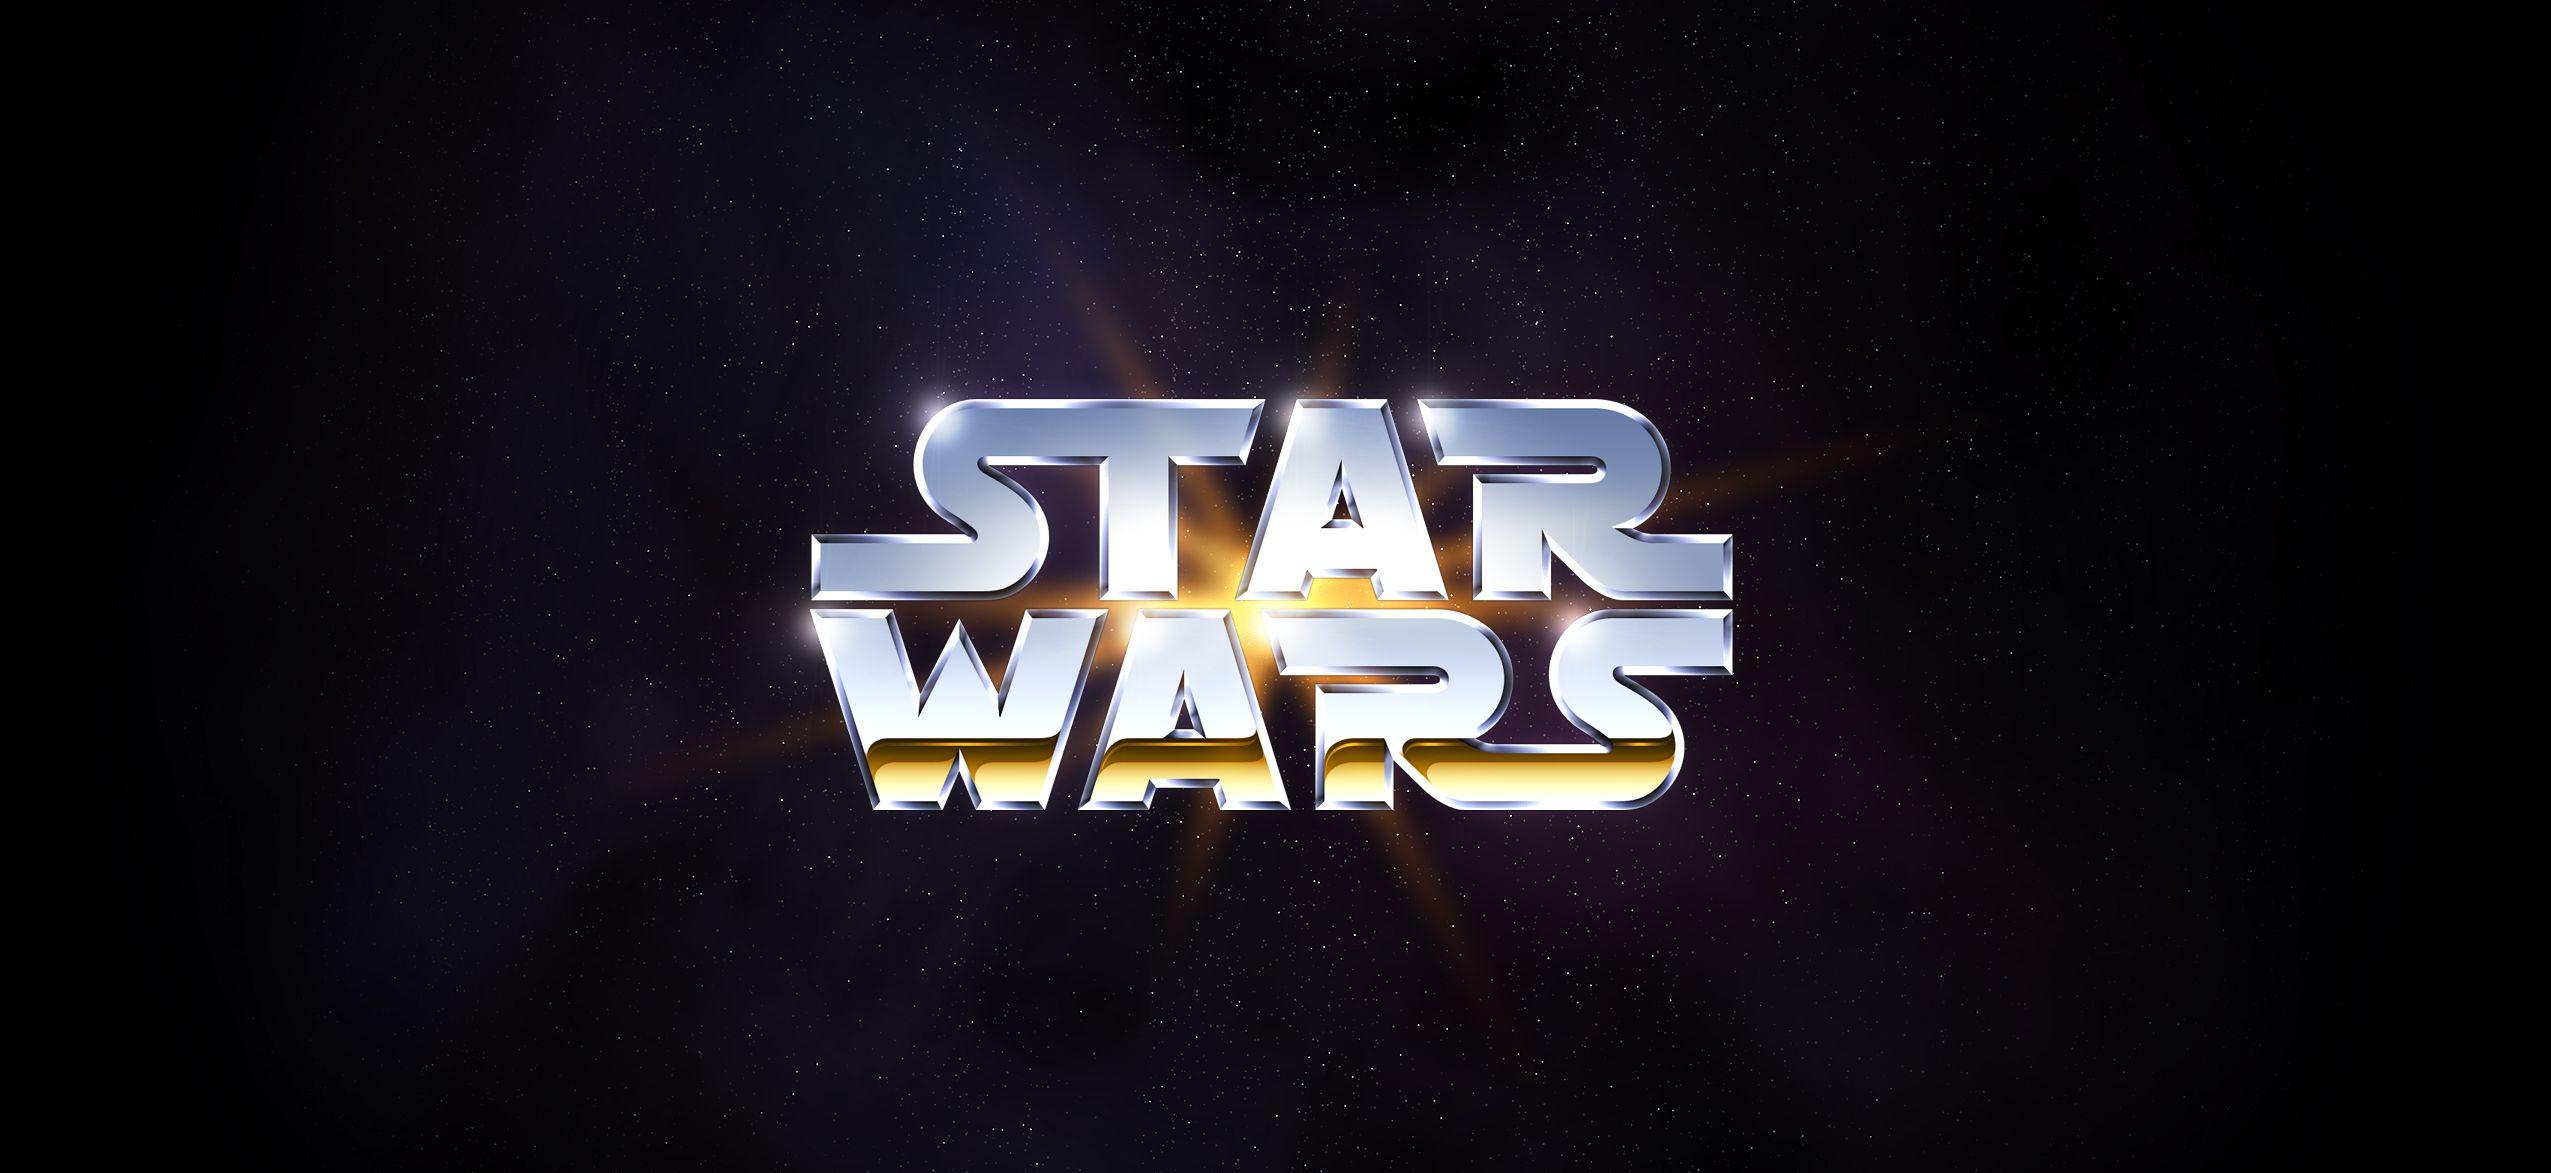 J.J. Abrams says the script is set for Star Wars: Episode VII